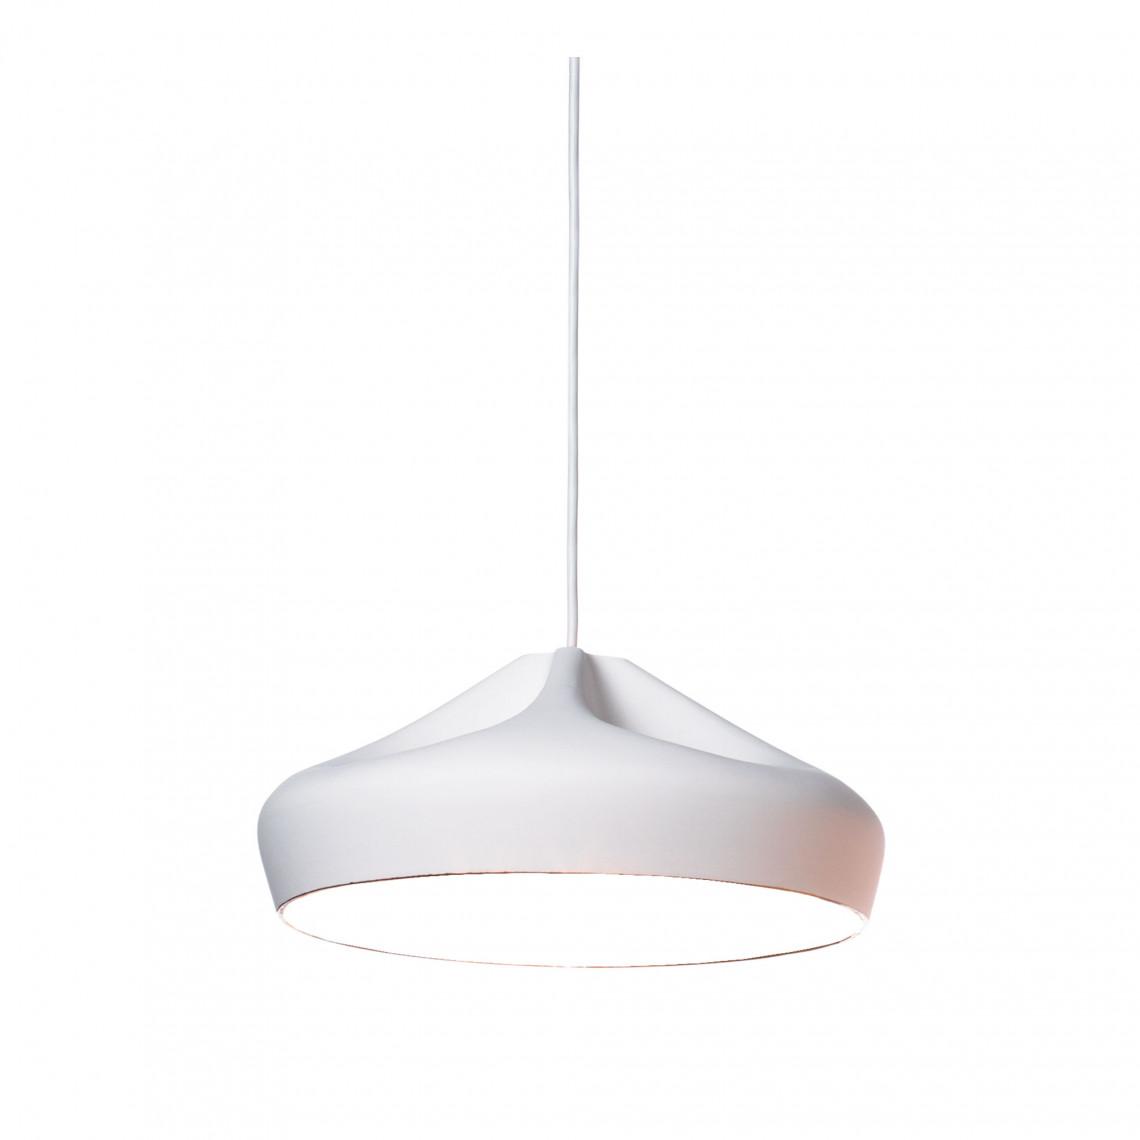 Pleat Box 36 - Pendant Lamp White/White